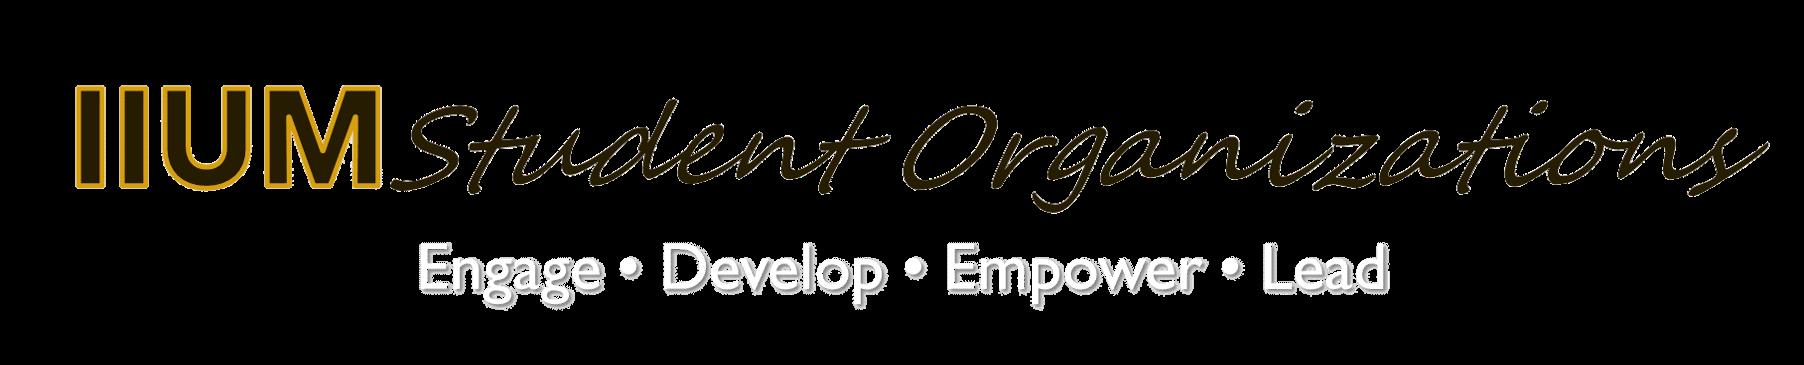 IIUM Student Organisations